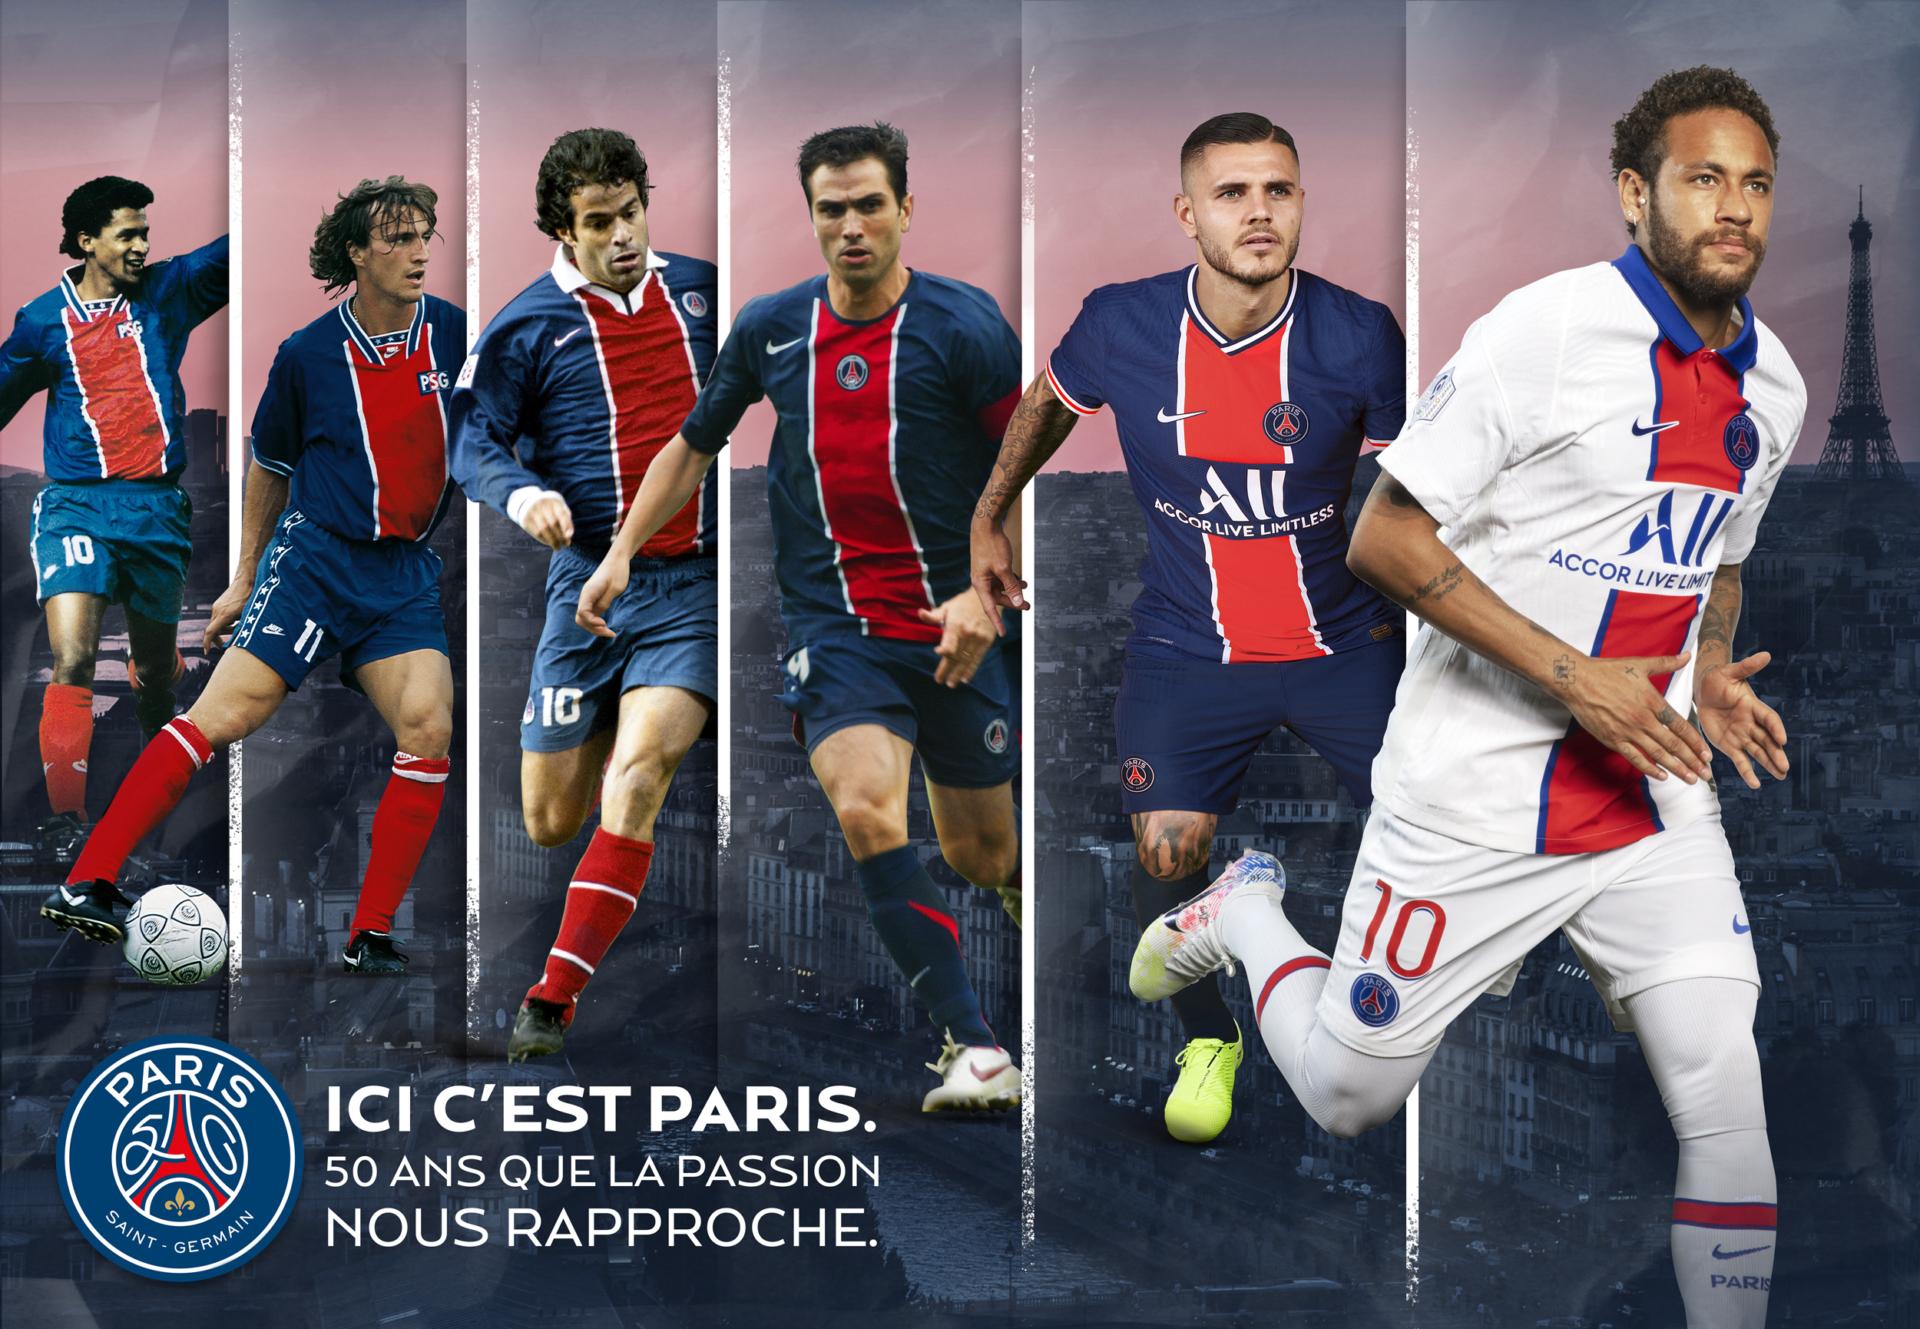 Campagne 50 Ans Du Paris Saint Germain Psg Paris Saint Germain Agence Rosbeef